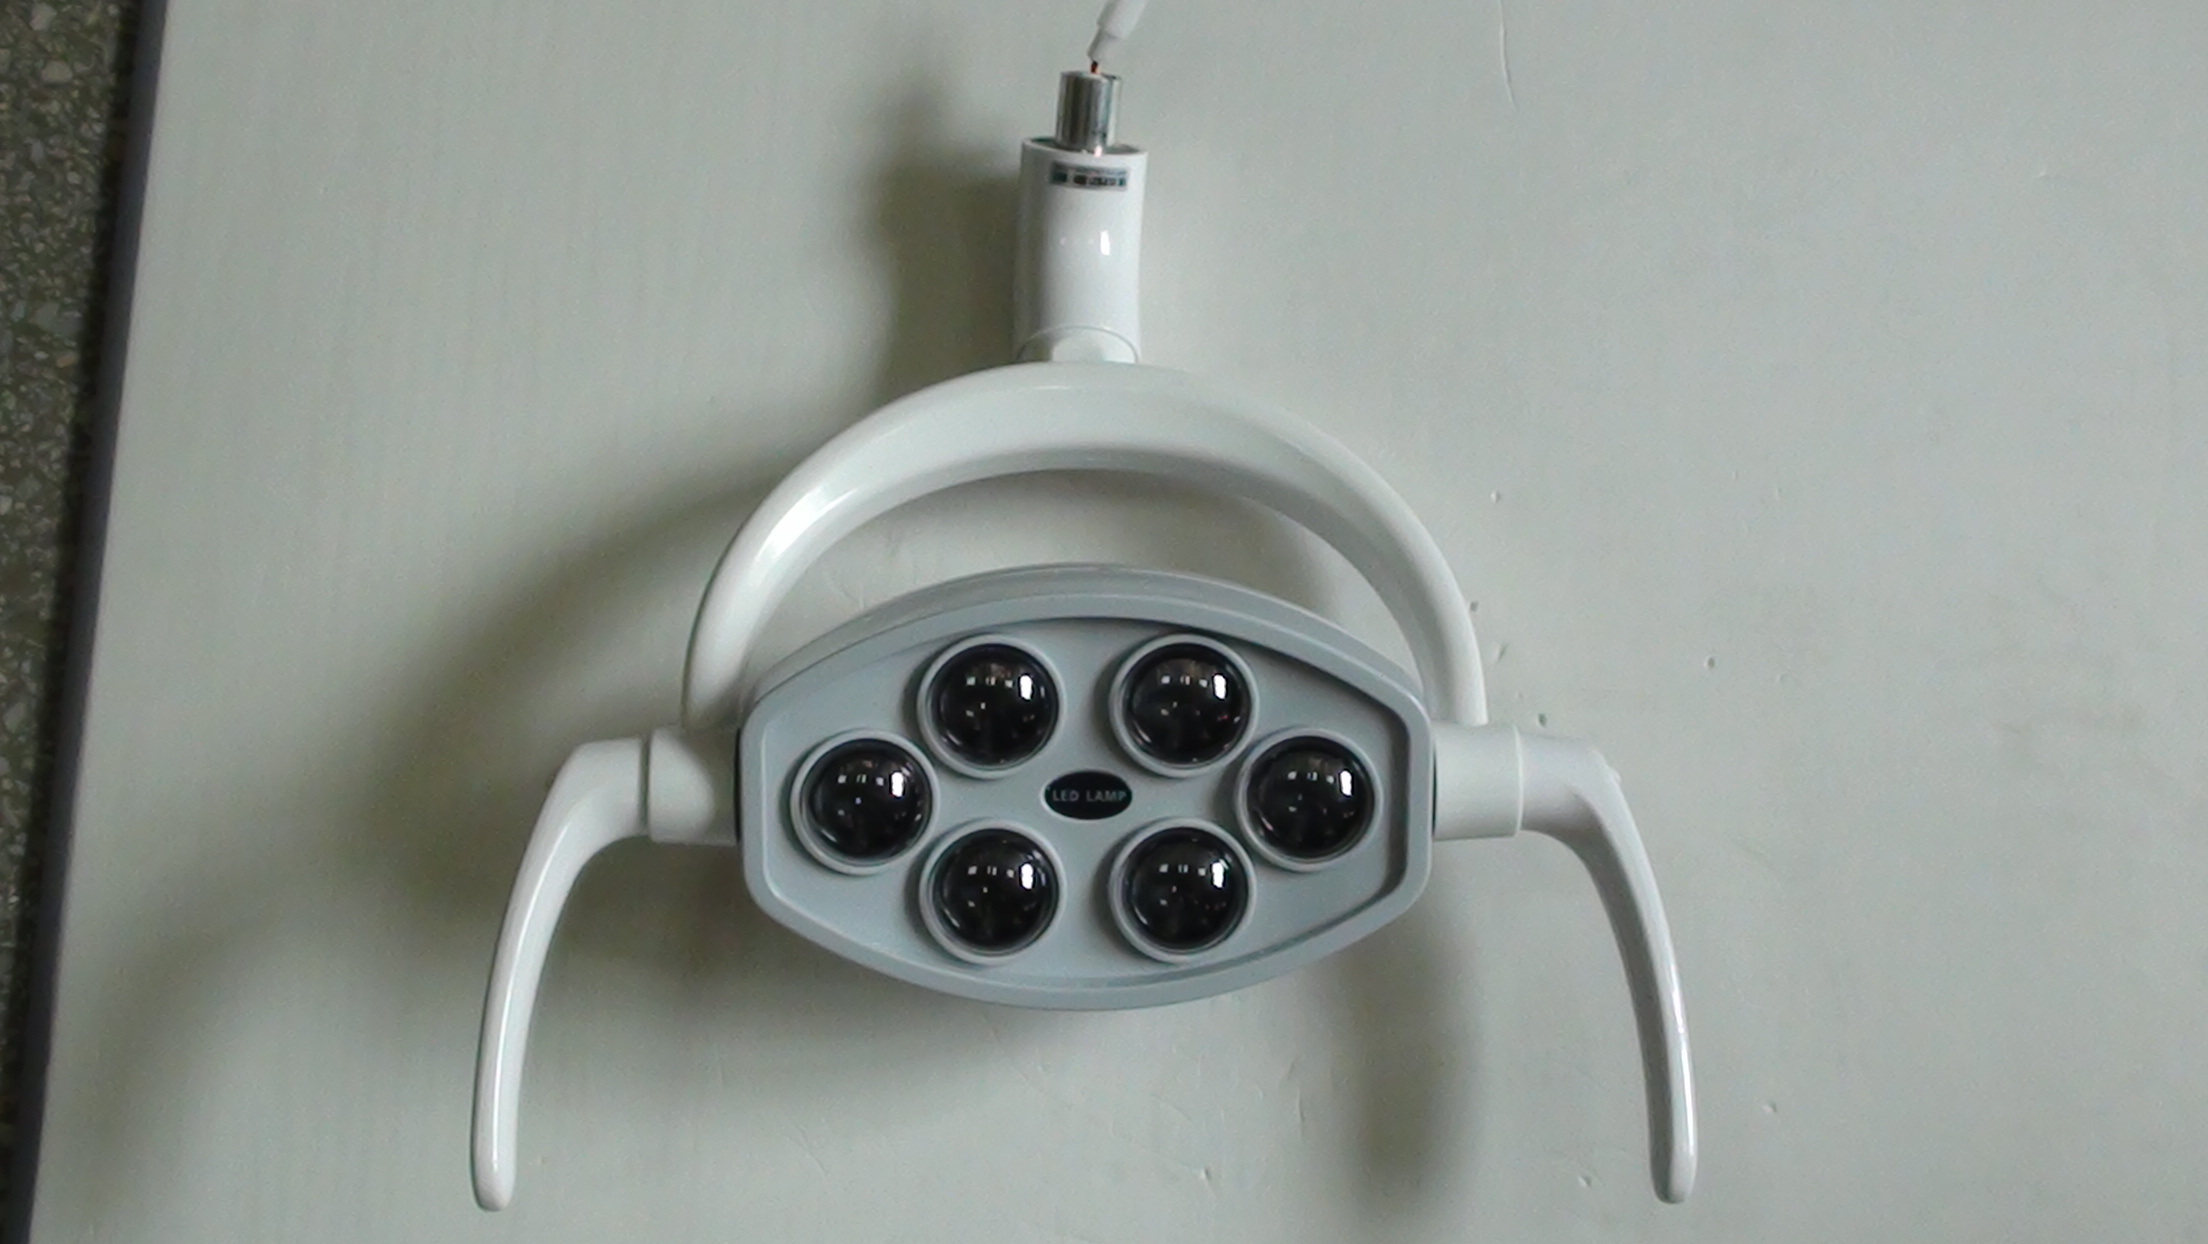 Dental LED Oral Light Induction Lamp for Dental Unit with Arm